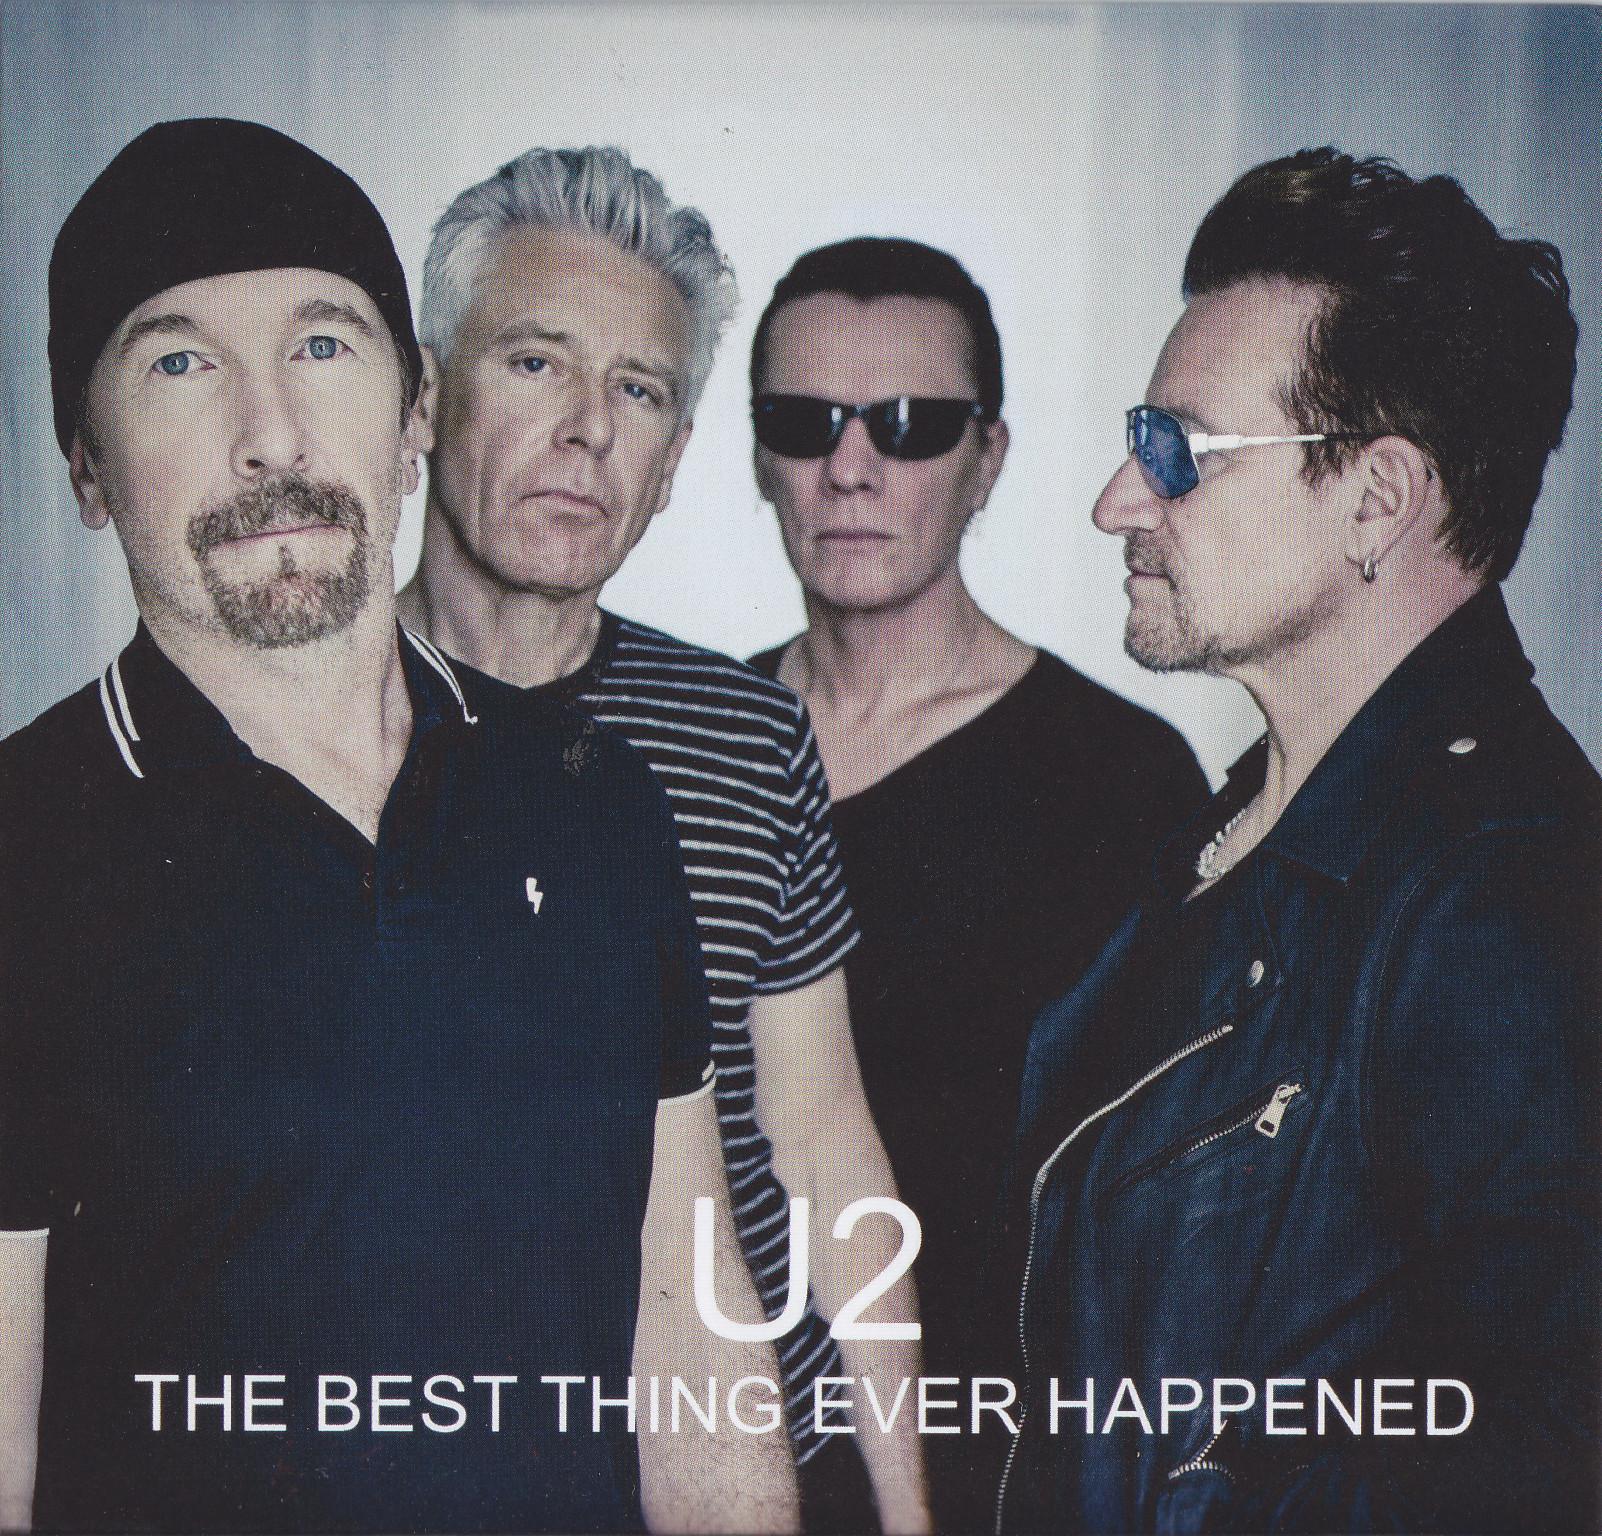 U2 / The Best Thing Ever Happened / 2CD Digipak – GiGinJapan